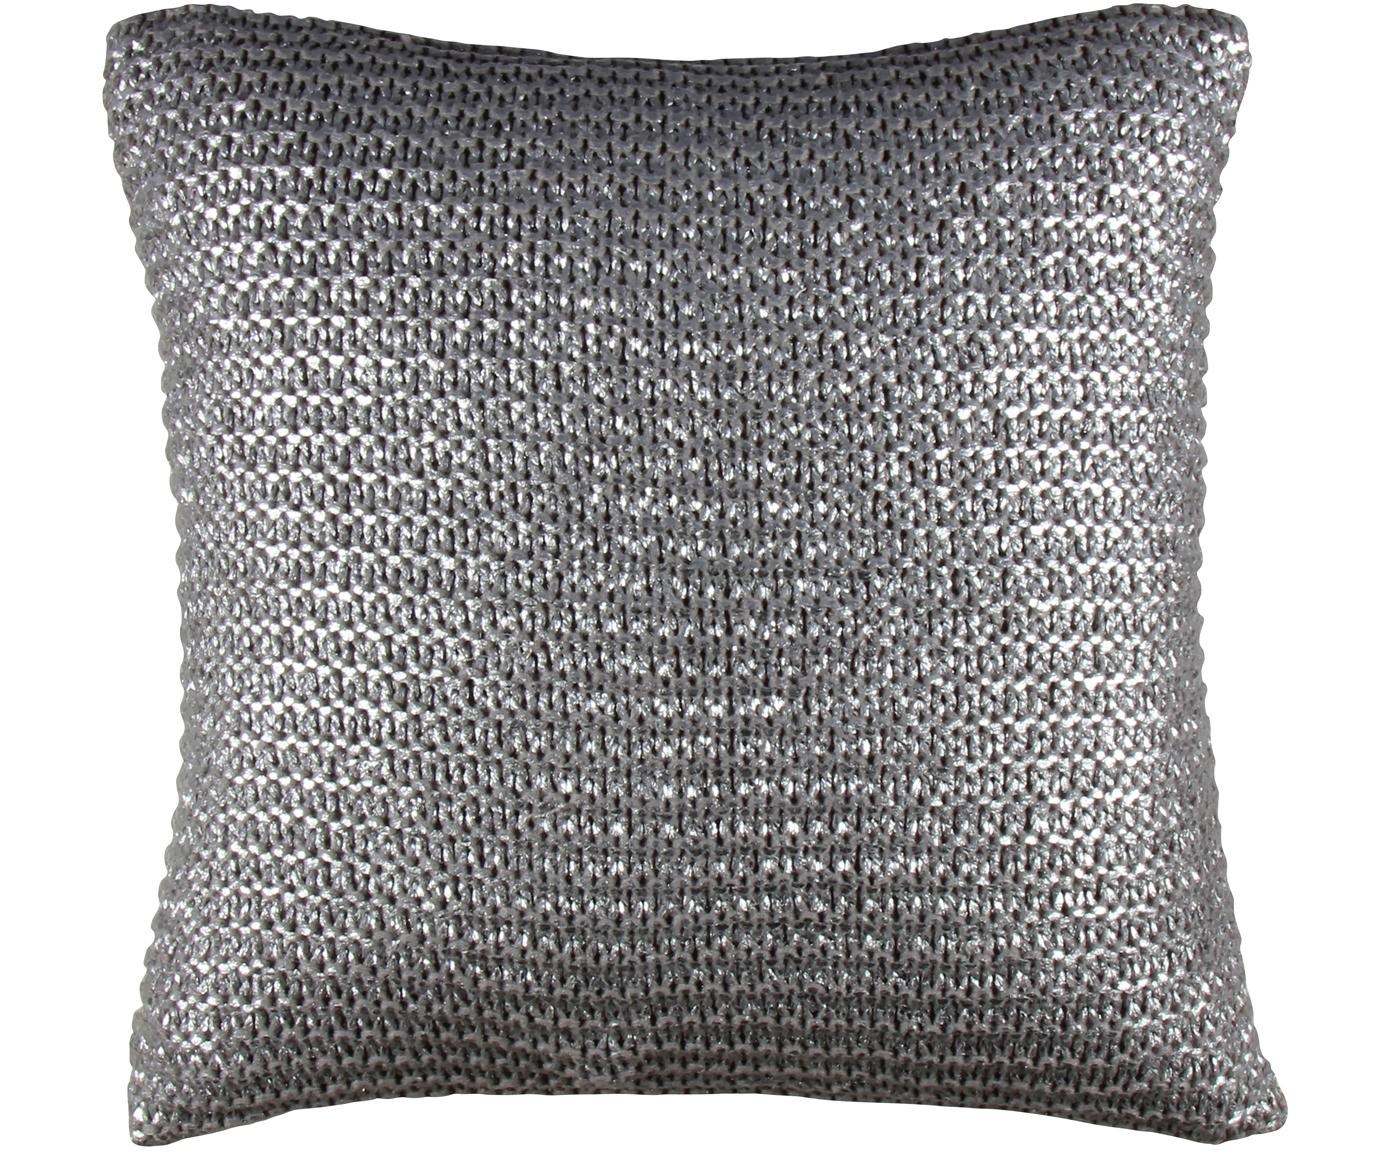 Schimmernde Kissenhülle Armour in Silber/Grau, Vorderseite: Acryl, Polyester, Rückseite: Baumwolle, Grau, 45 x 45 cm